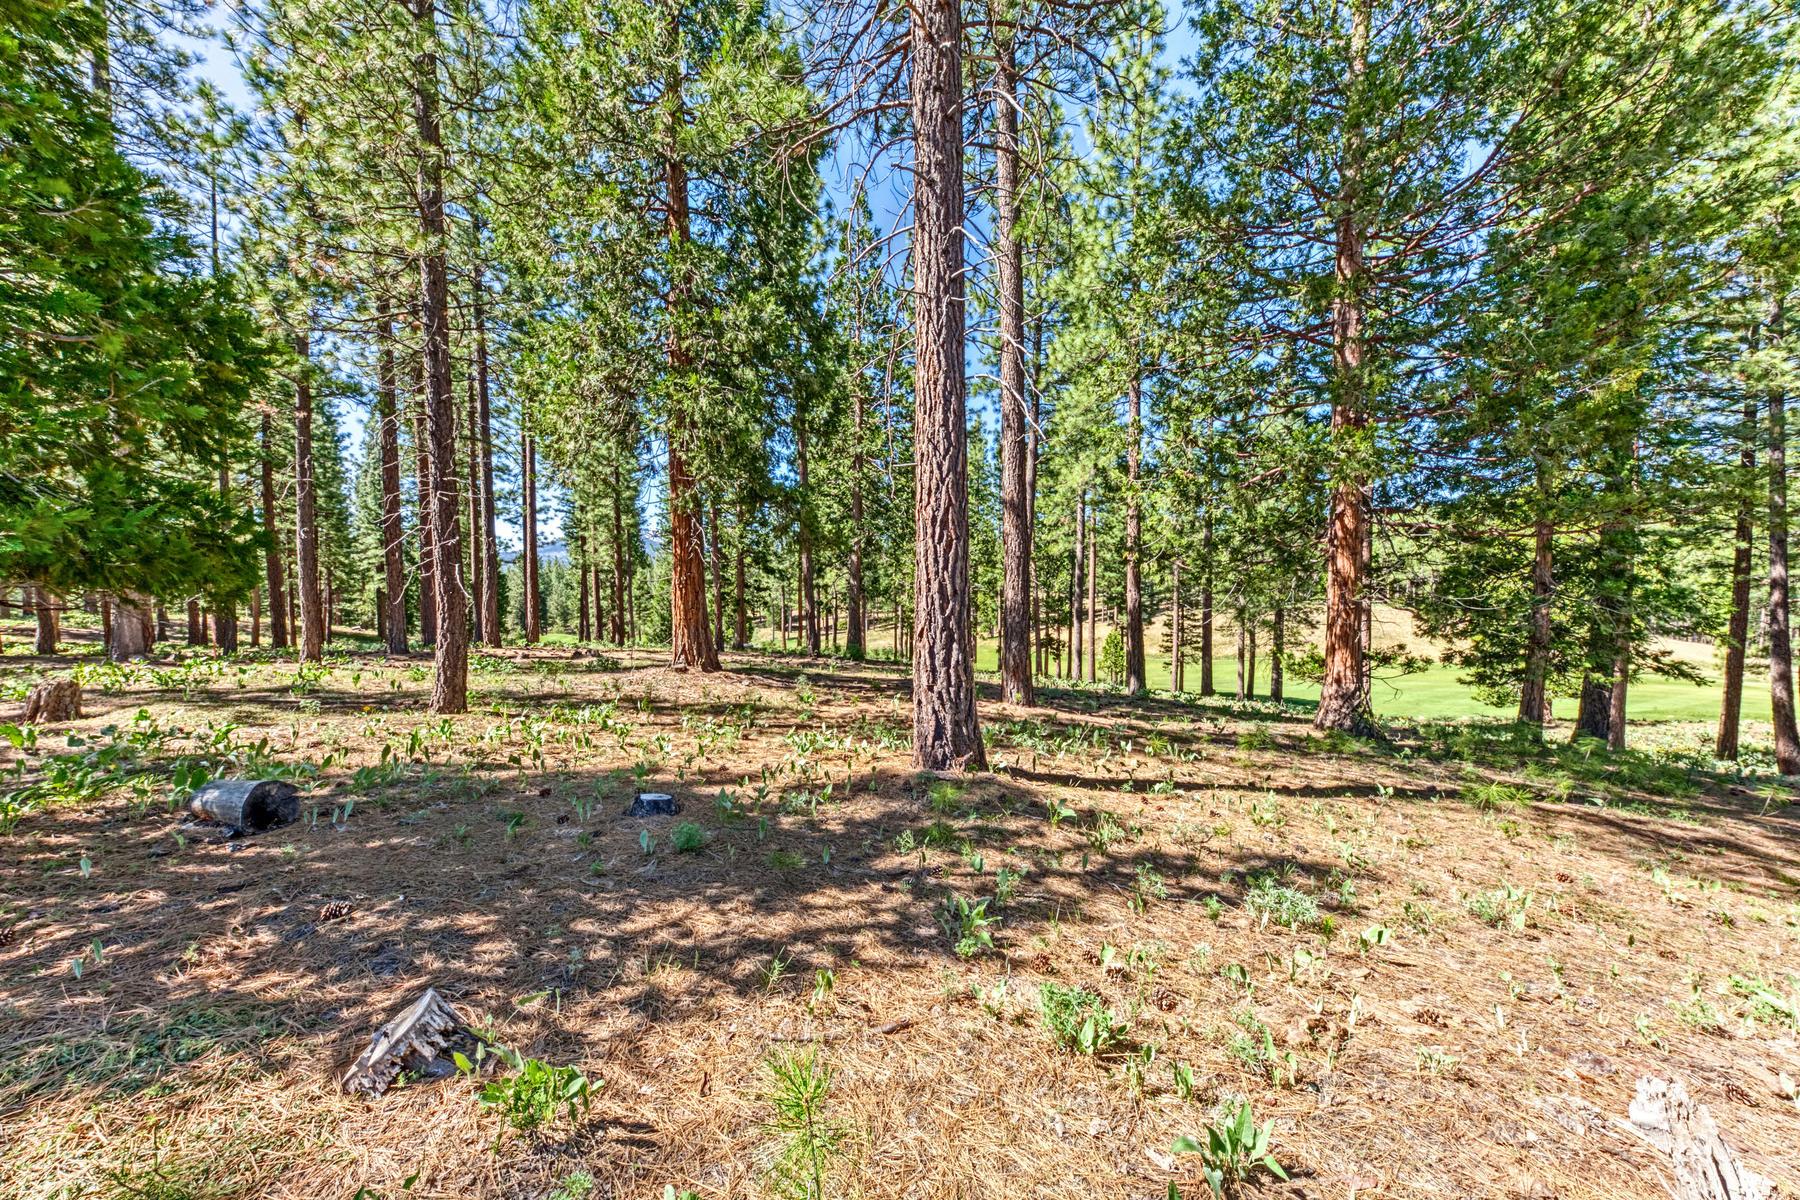 Additional photo for property listing at 178 Bird of Prey Lane, Portola, CA 96122 178 Bird of Prey Lane Portola, California 96122 Estados Unidos